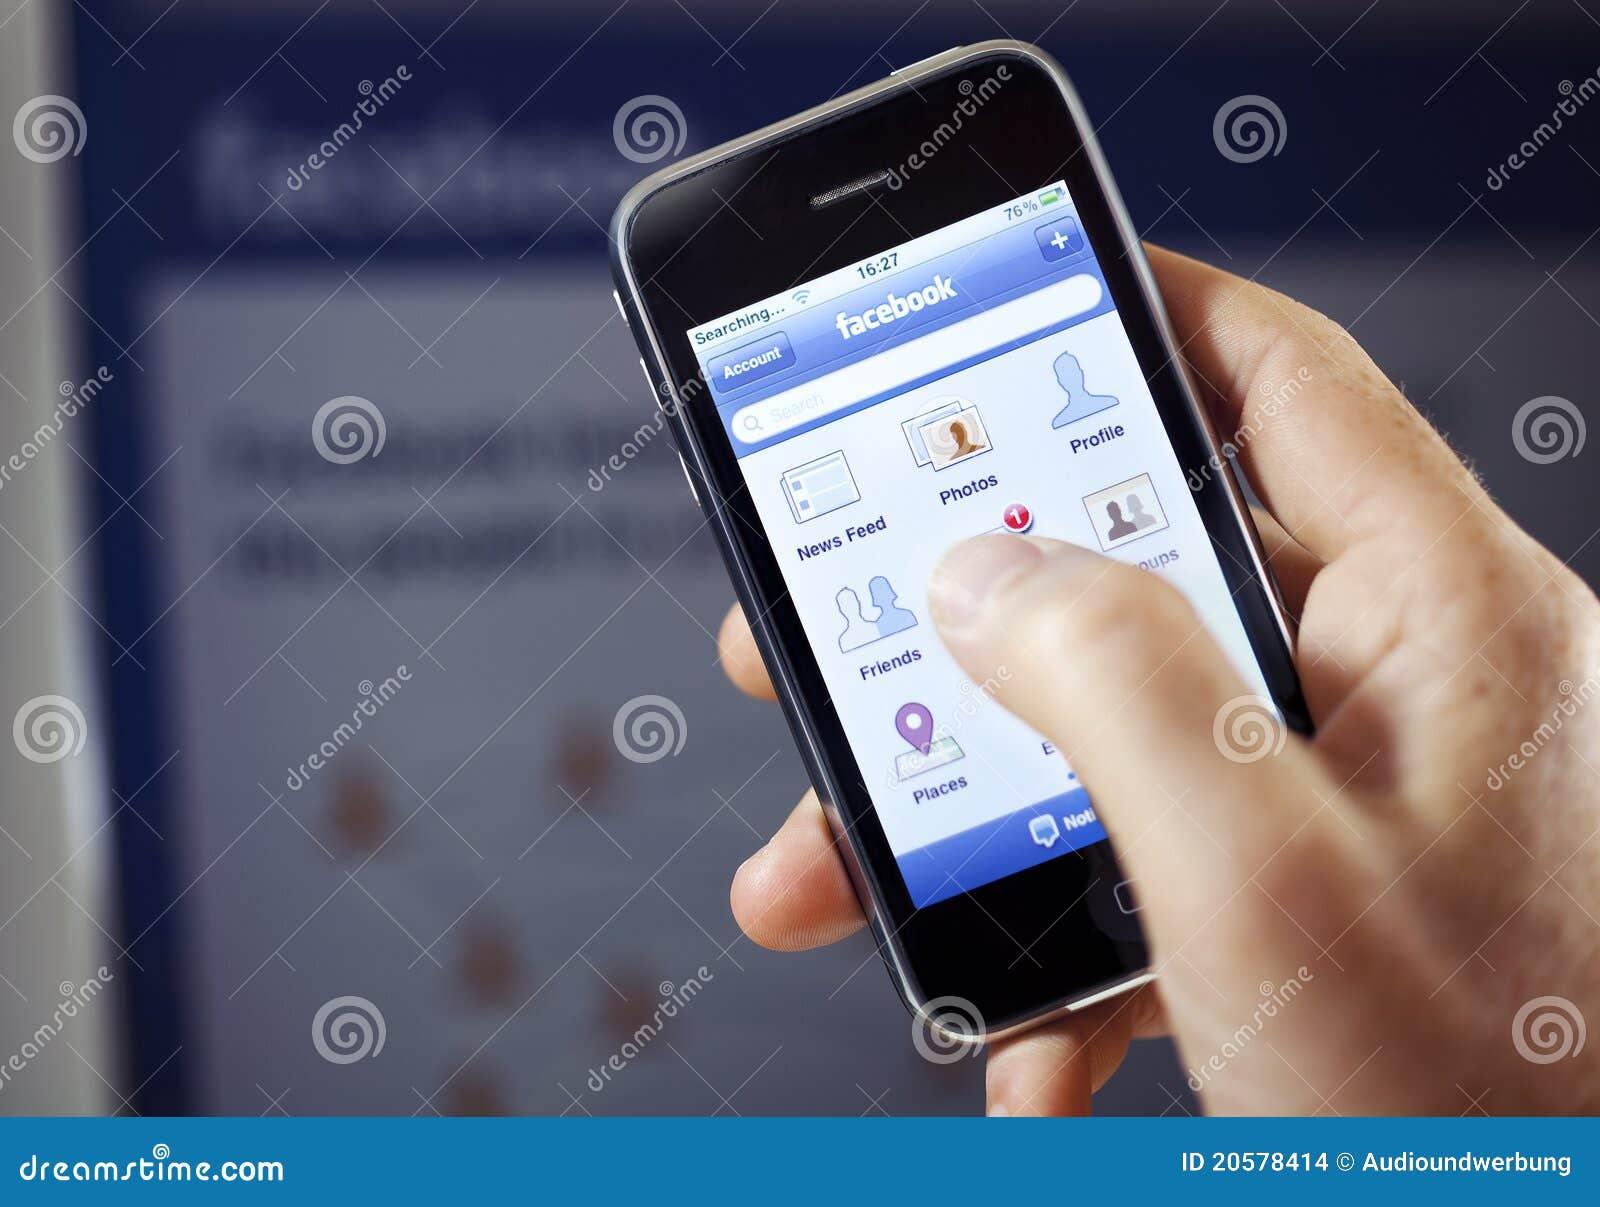 Facebook App on Apple iPhone